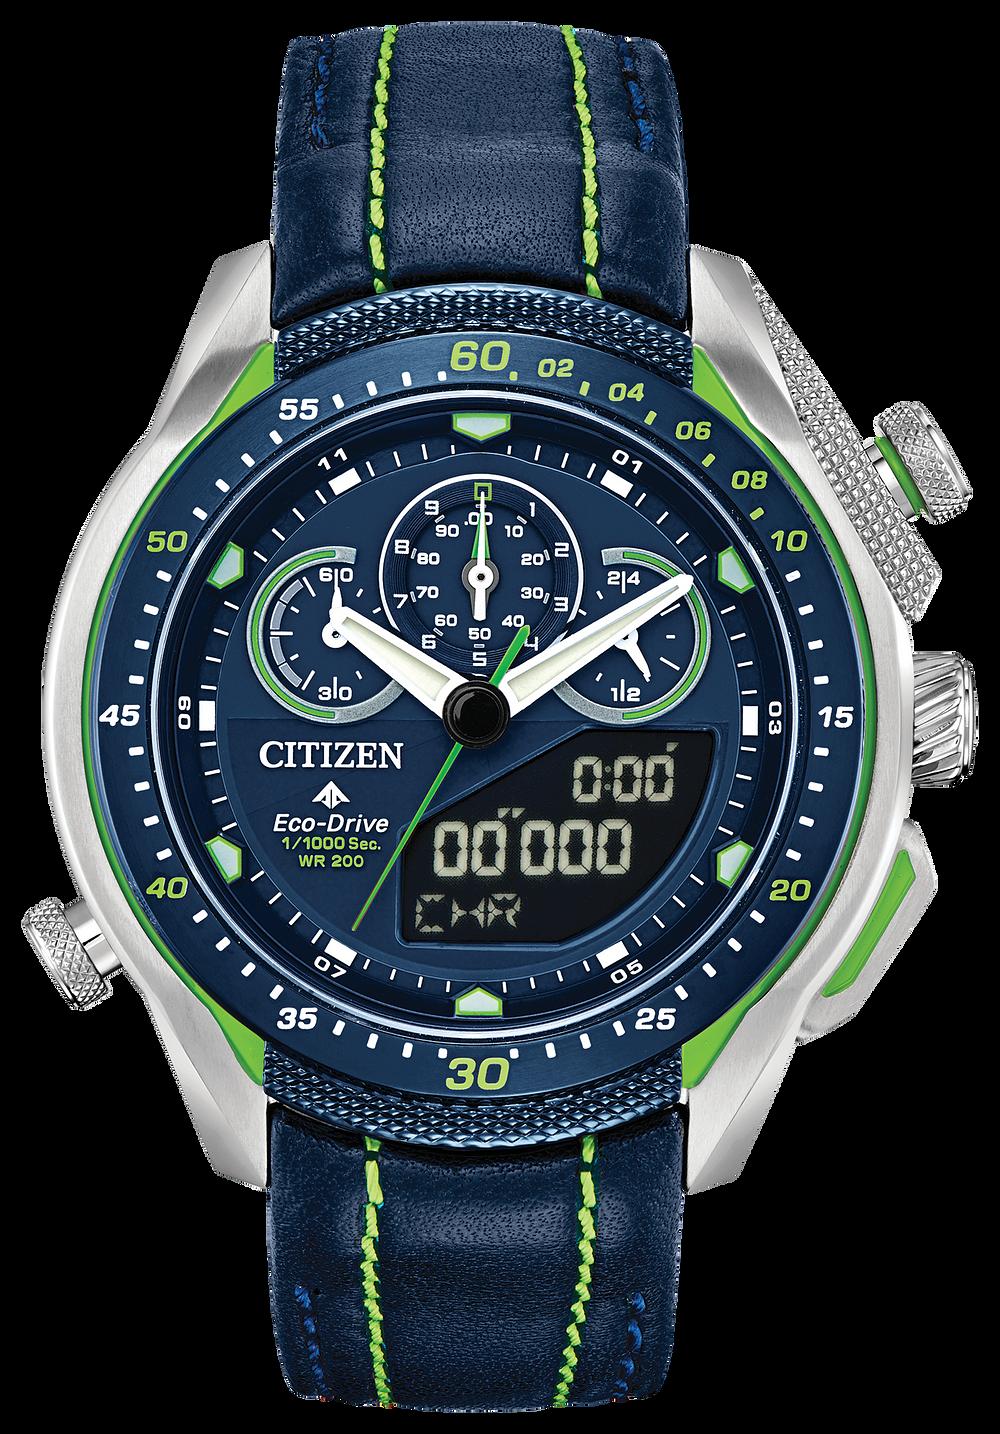 Citizen's new Promaster SST Promaster%20SST